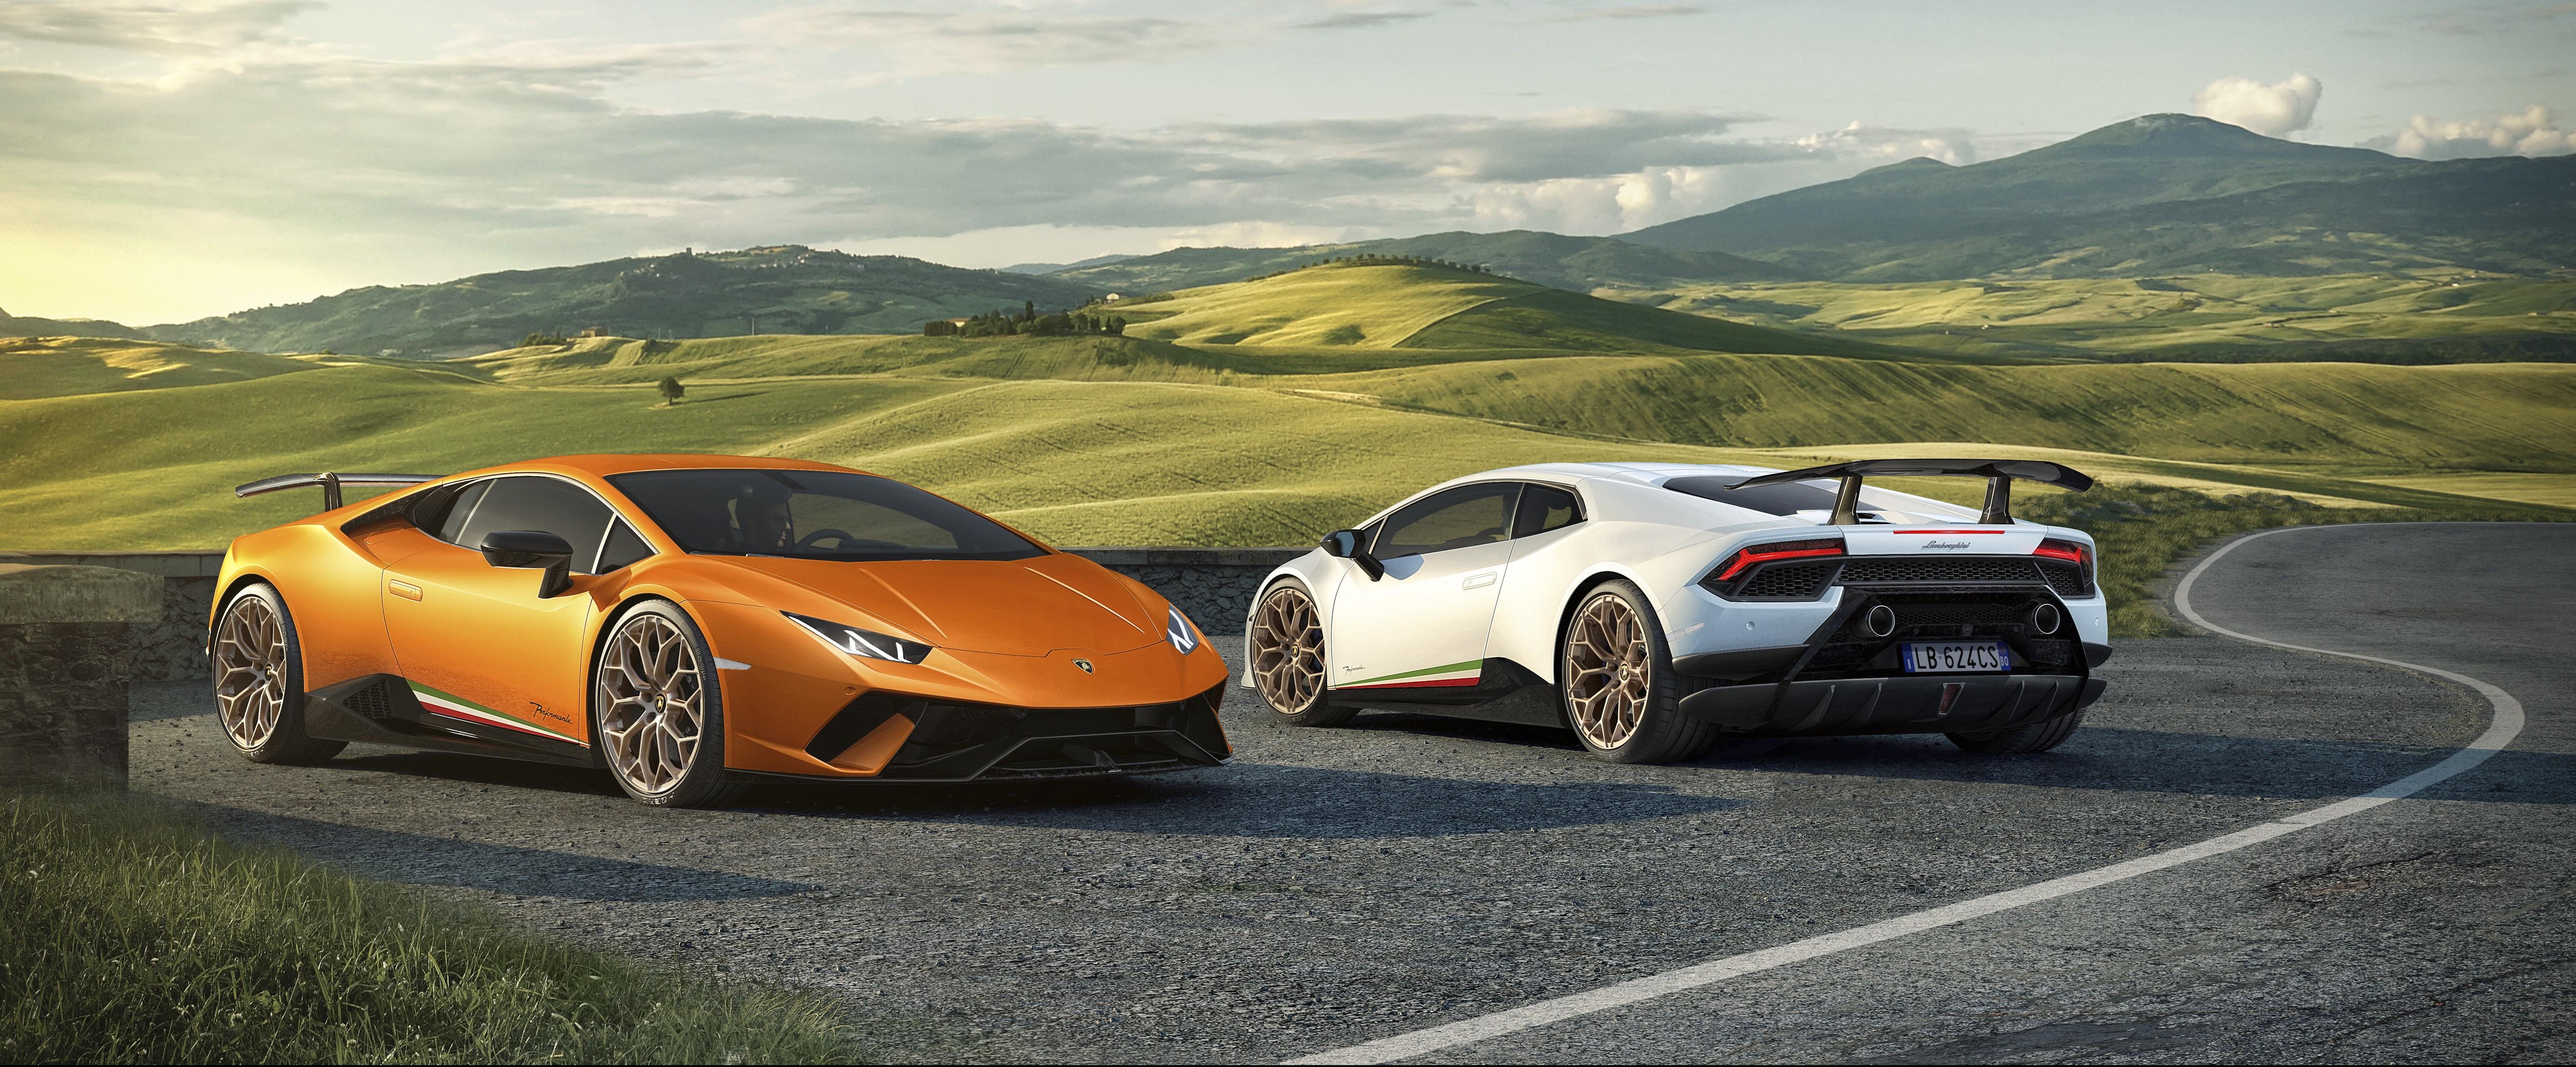 2020 Lamborghini Huracan Evo Shows Off Redesigned Rear Fascia